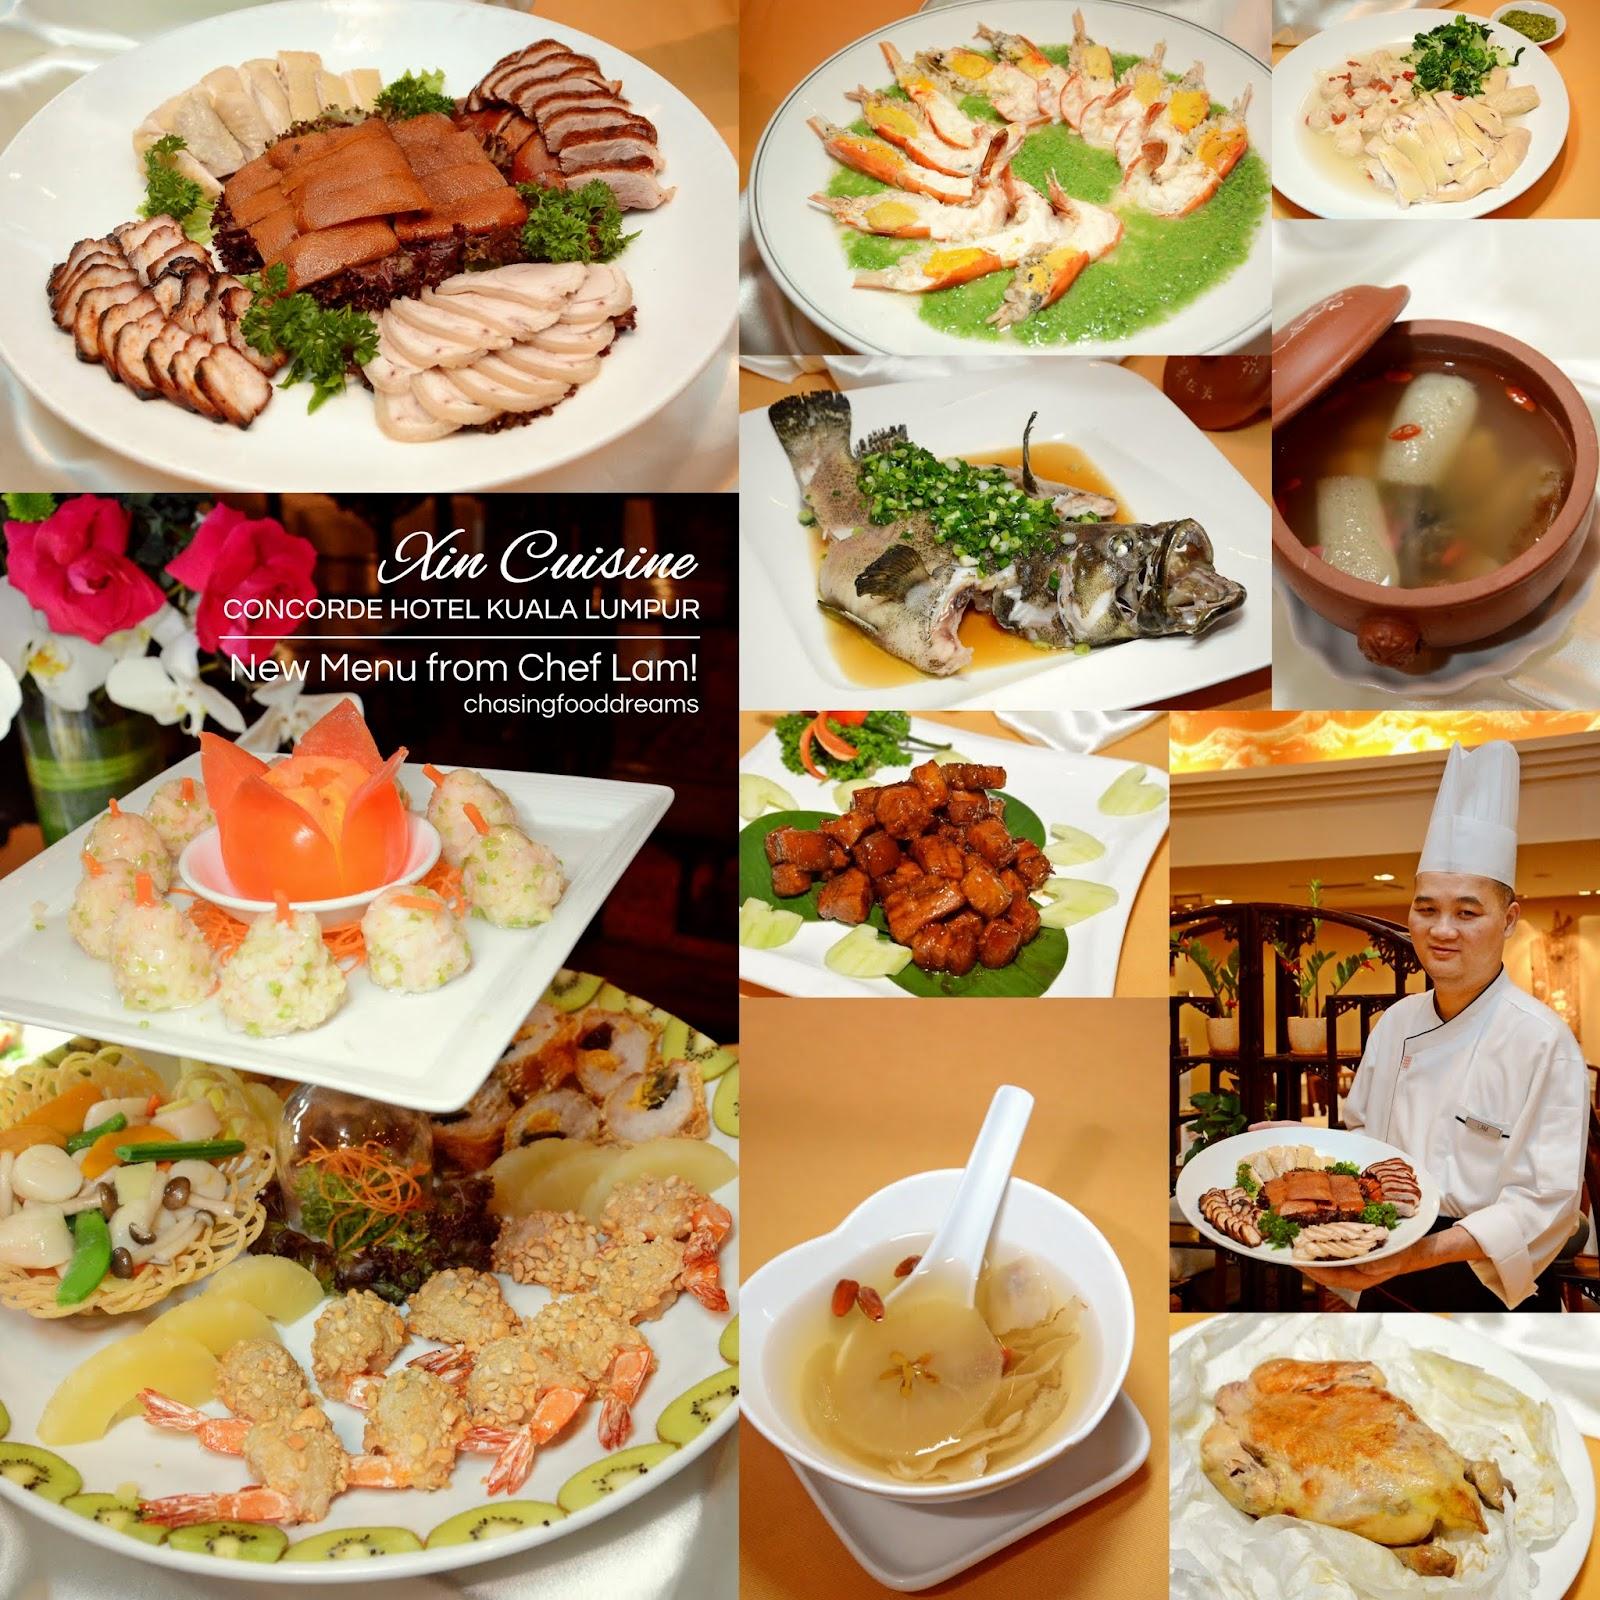 Chasing Food Dreams Xin Cuisine Concorde Hotel Kuala Lumpur New Menu